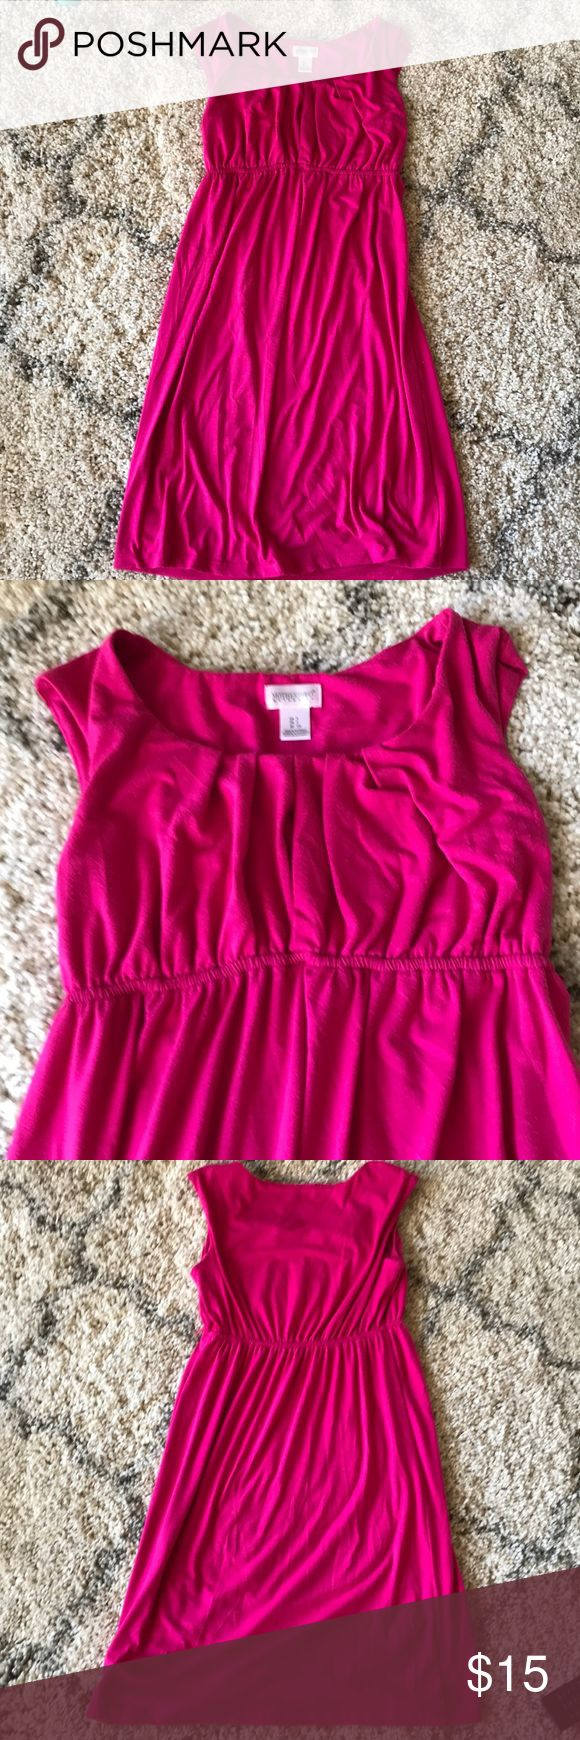 Pink Maternity dress Adorable pink sleeveless maternity dress Motherhood Maternity Dresses Midi